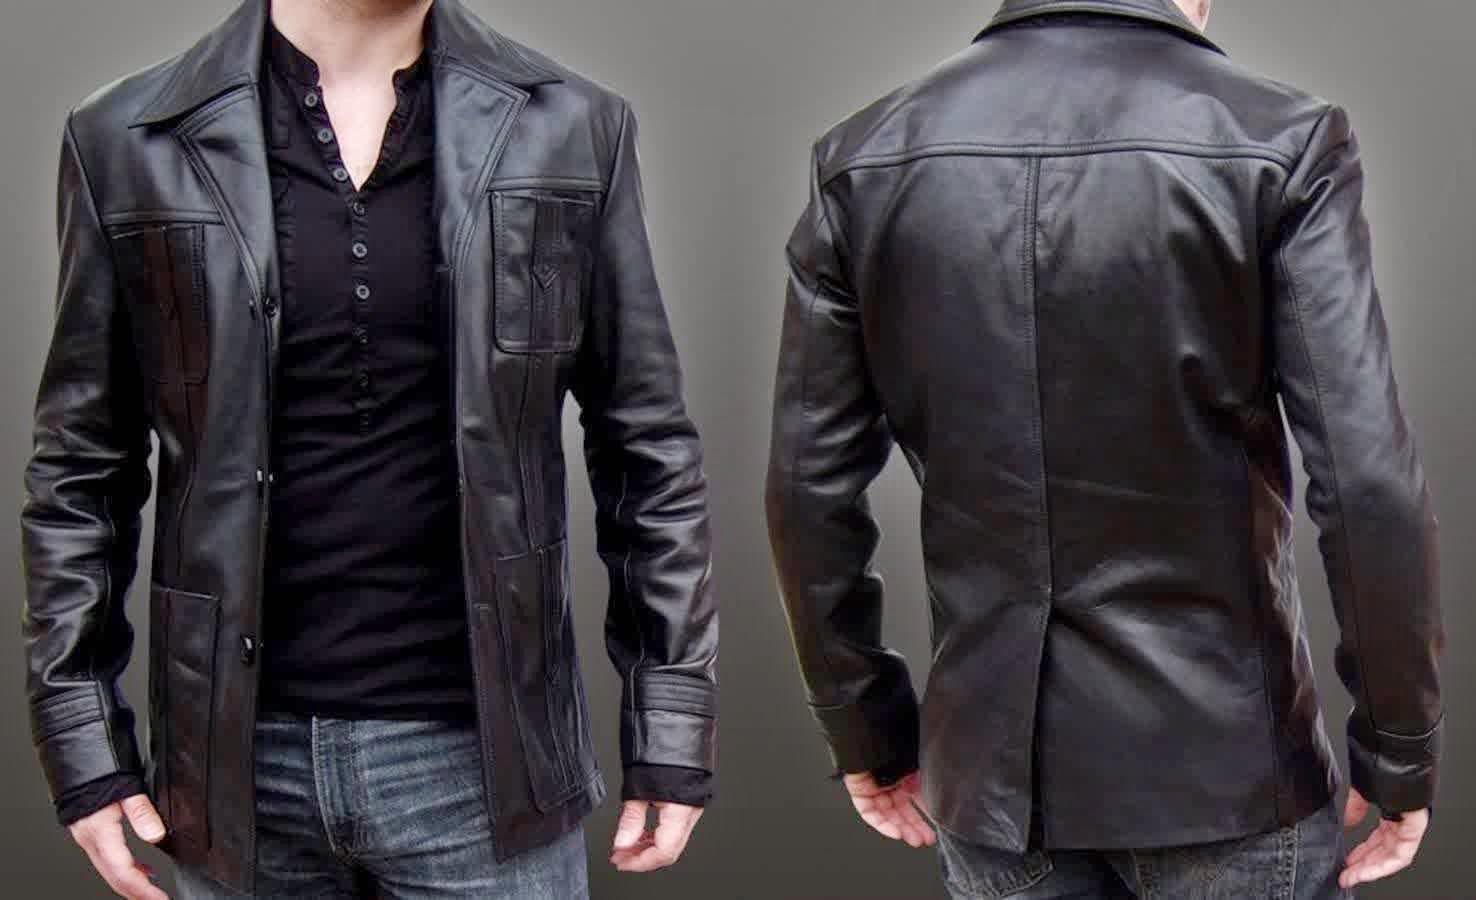 Jaket Kulit Murah Enter Your Blog Topic Here Semi Model Ariel Noah Leather